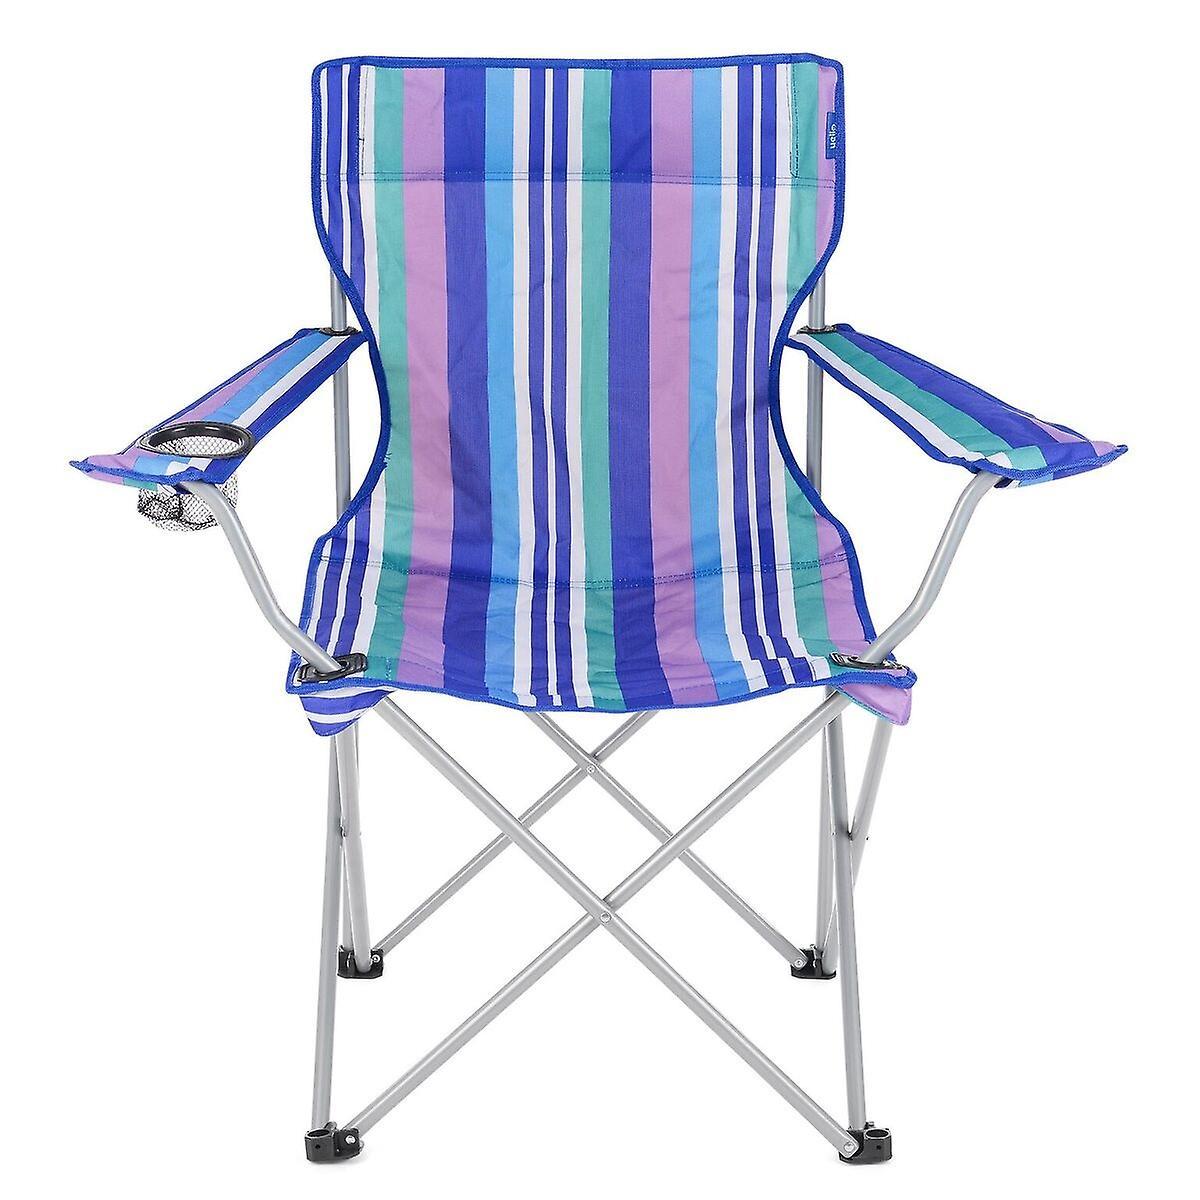 Yello Folding Beach Chair For Camping Fishing Or Beach Blue Stripes